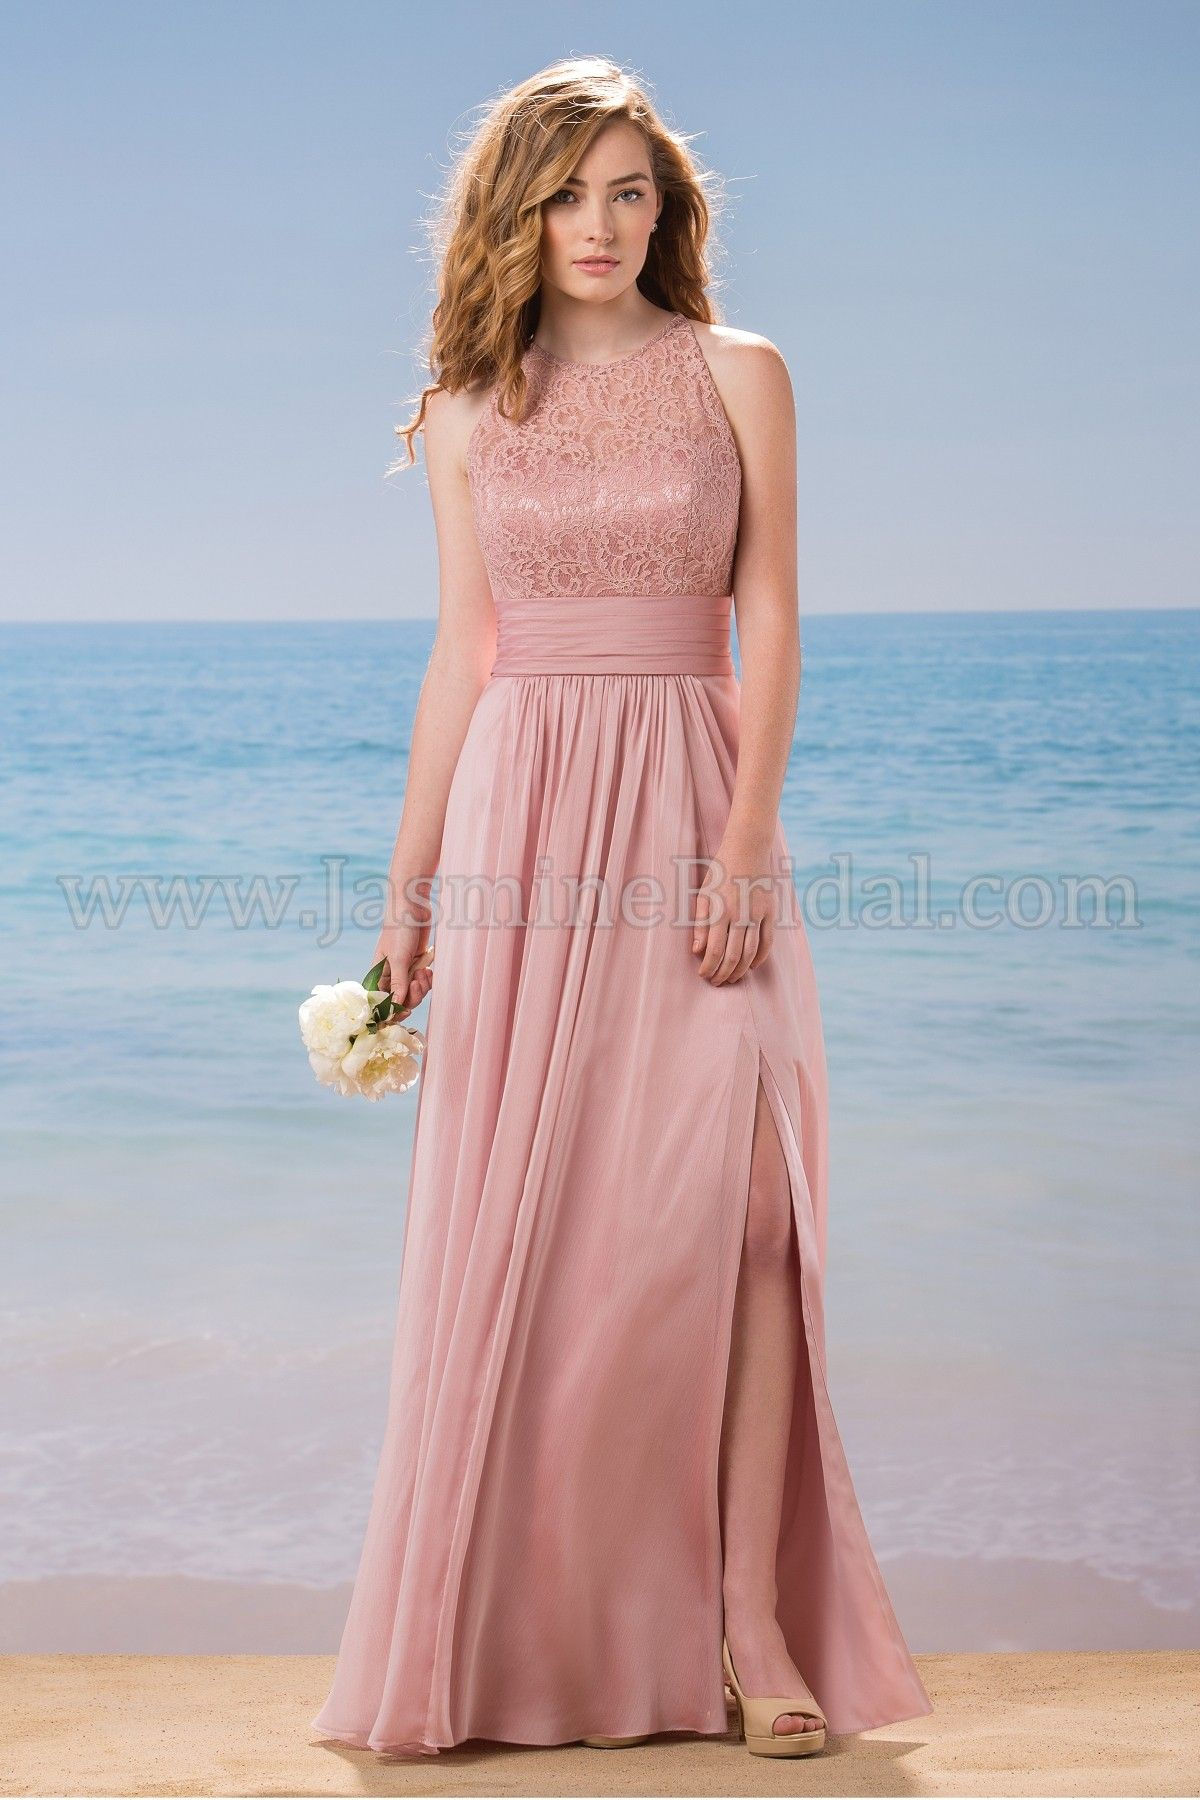 Jasmine Belsoie Style L184015 Bridesmaids Dresses